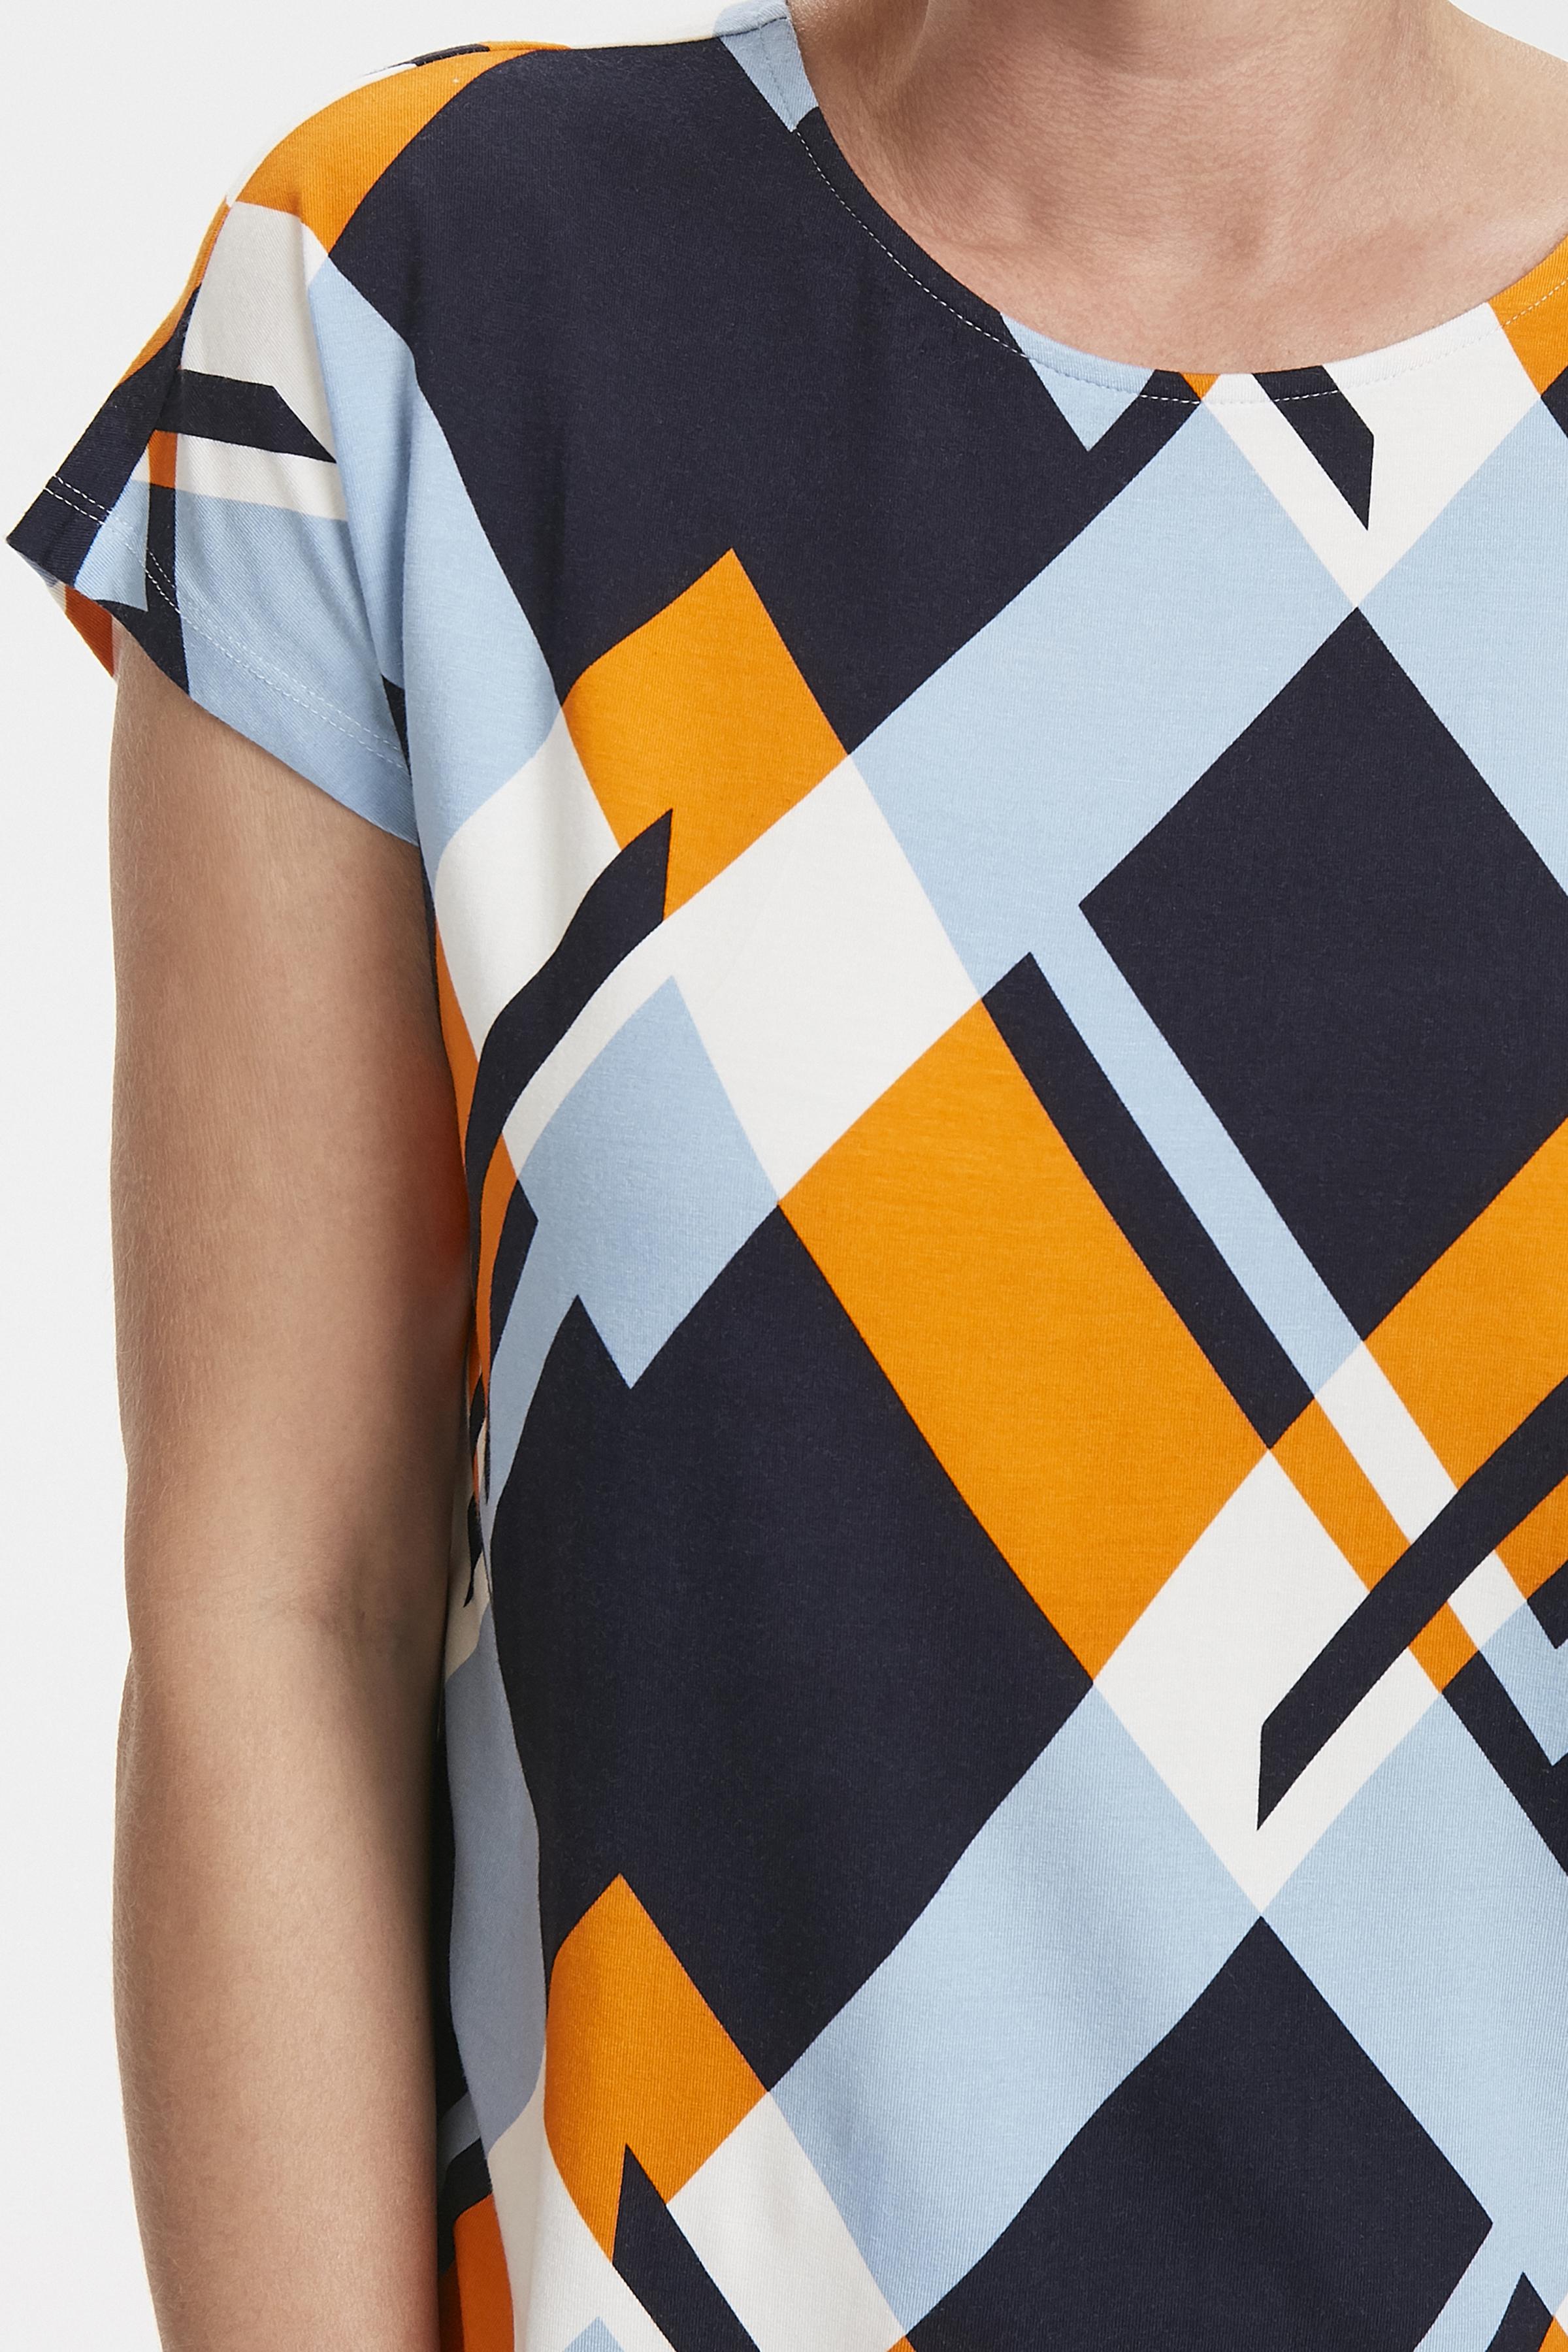 Marineblå/orange Kortærmet T-shirt fra Fransa – Køb Marineblå/orange Kortærmet T-shirt fra str. XS-XXL her